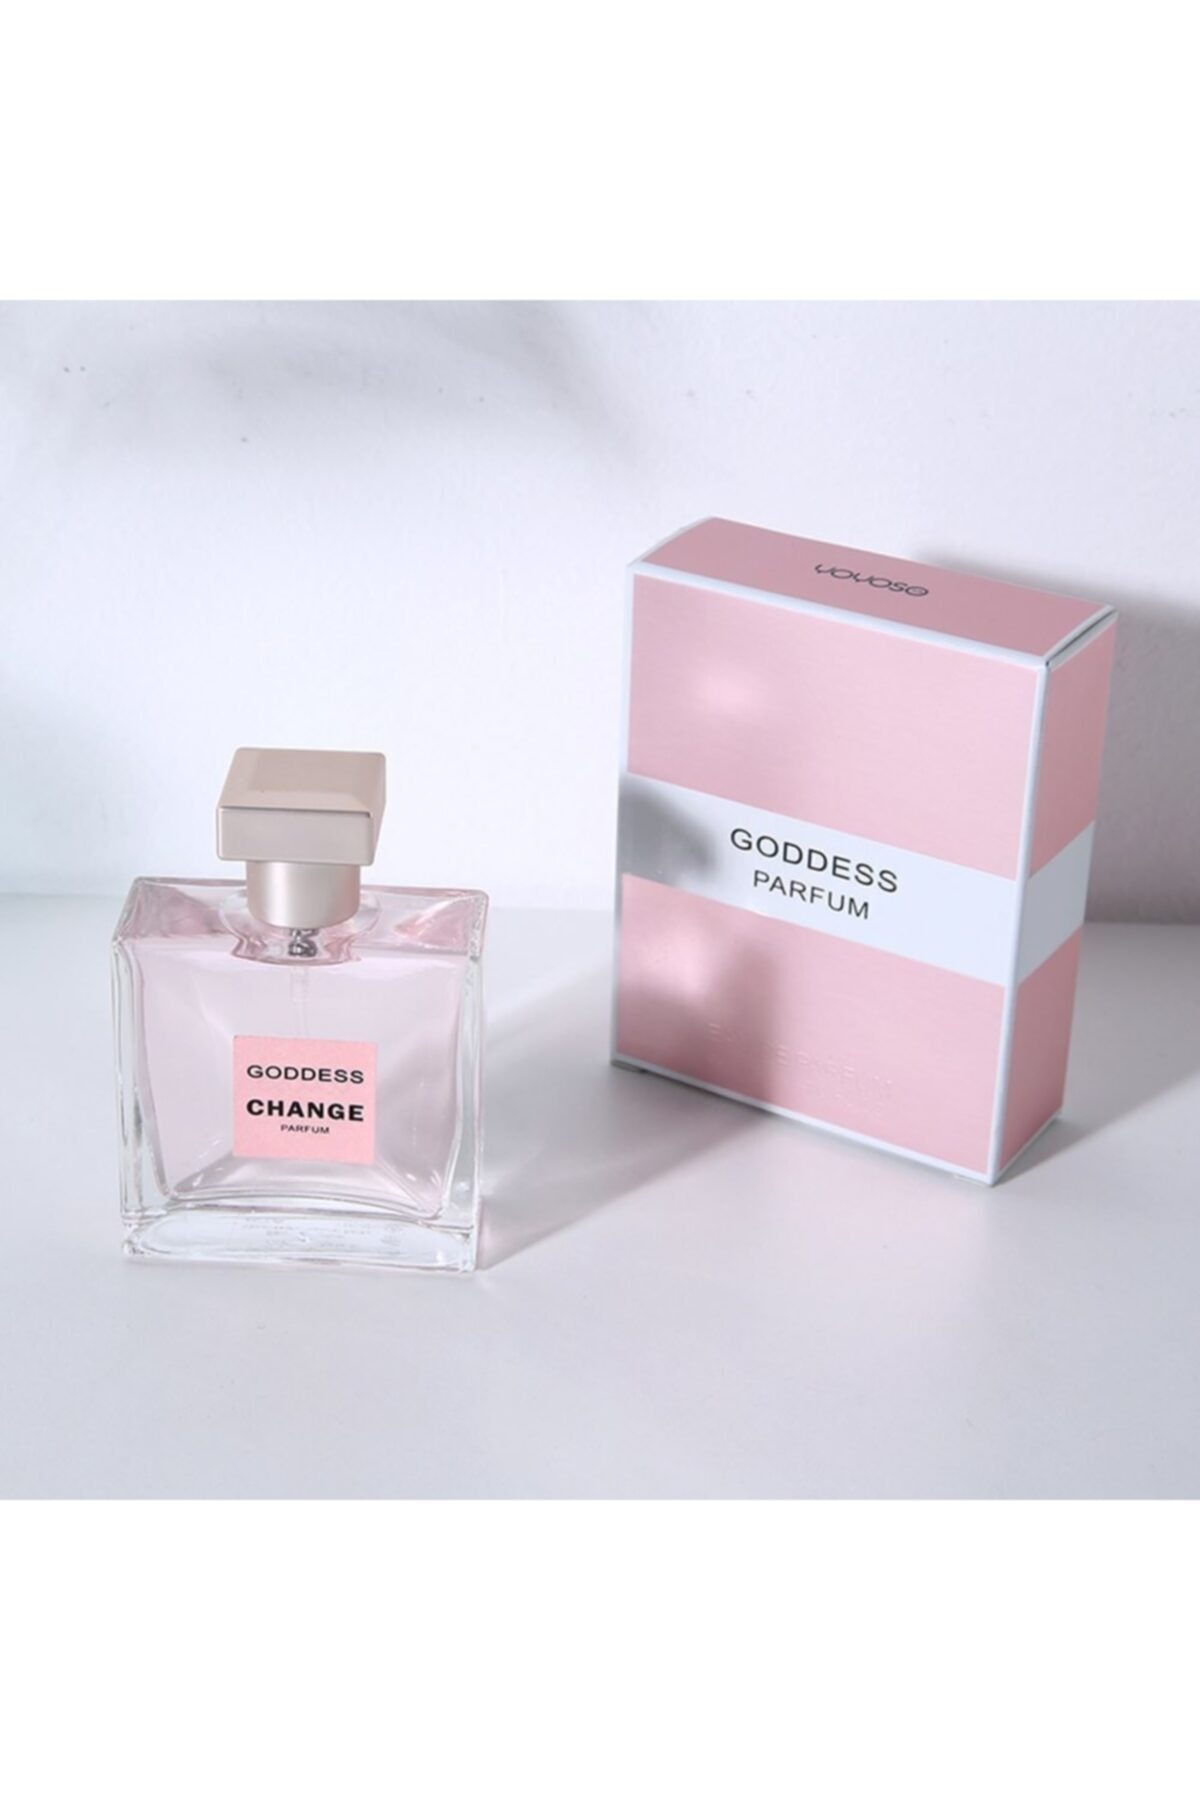 YOYOSO Goddness Chane Kadın Parfüm 1